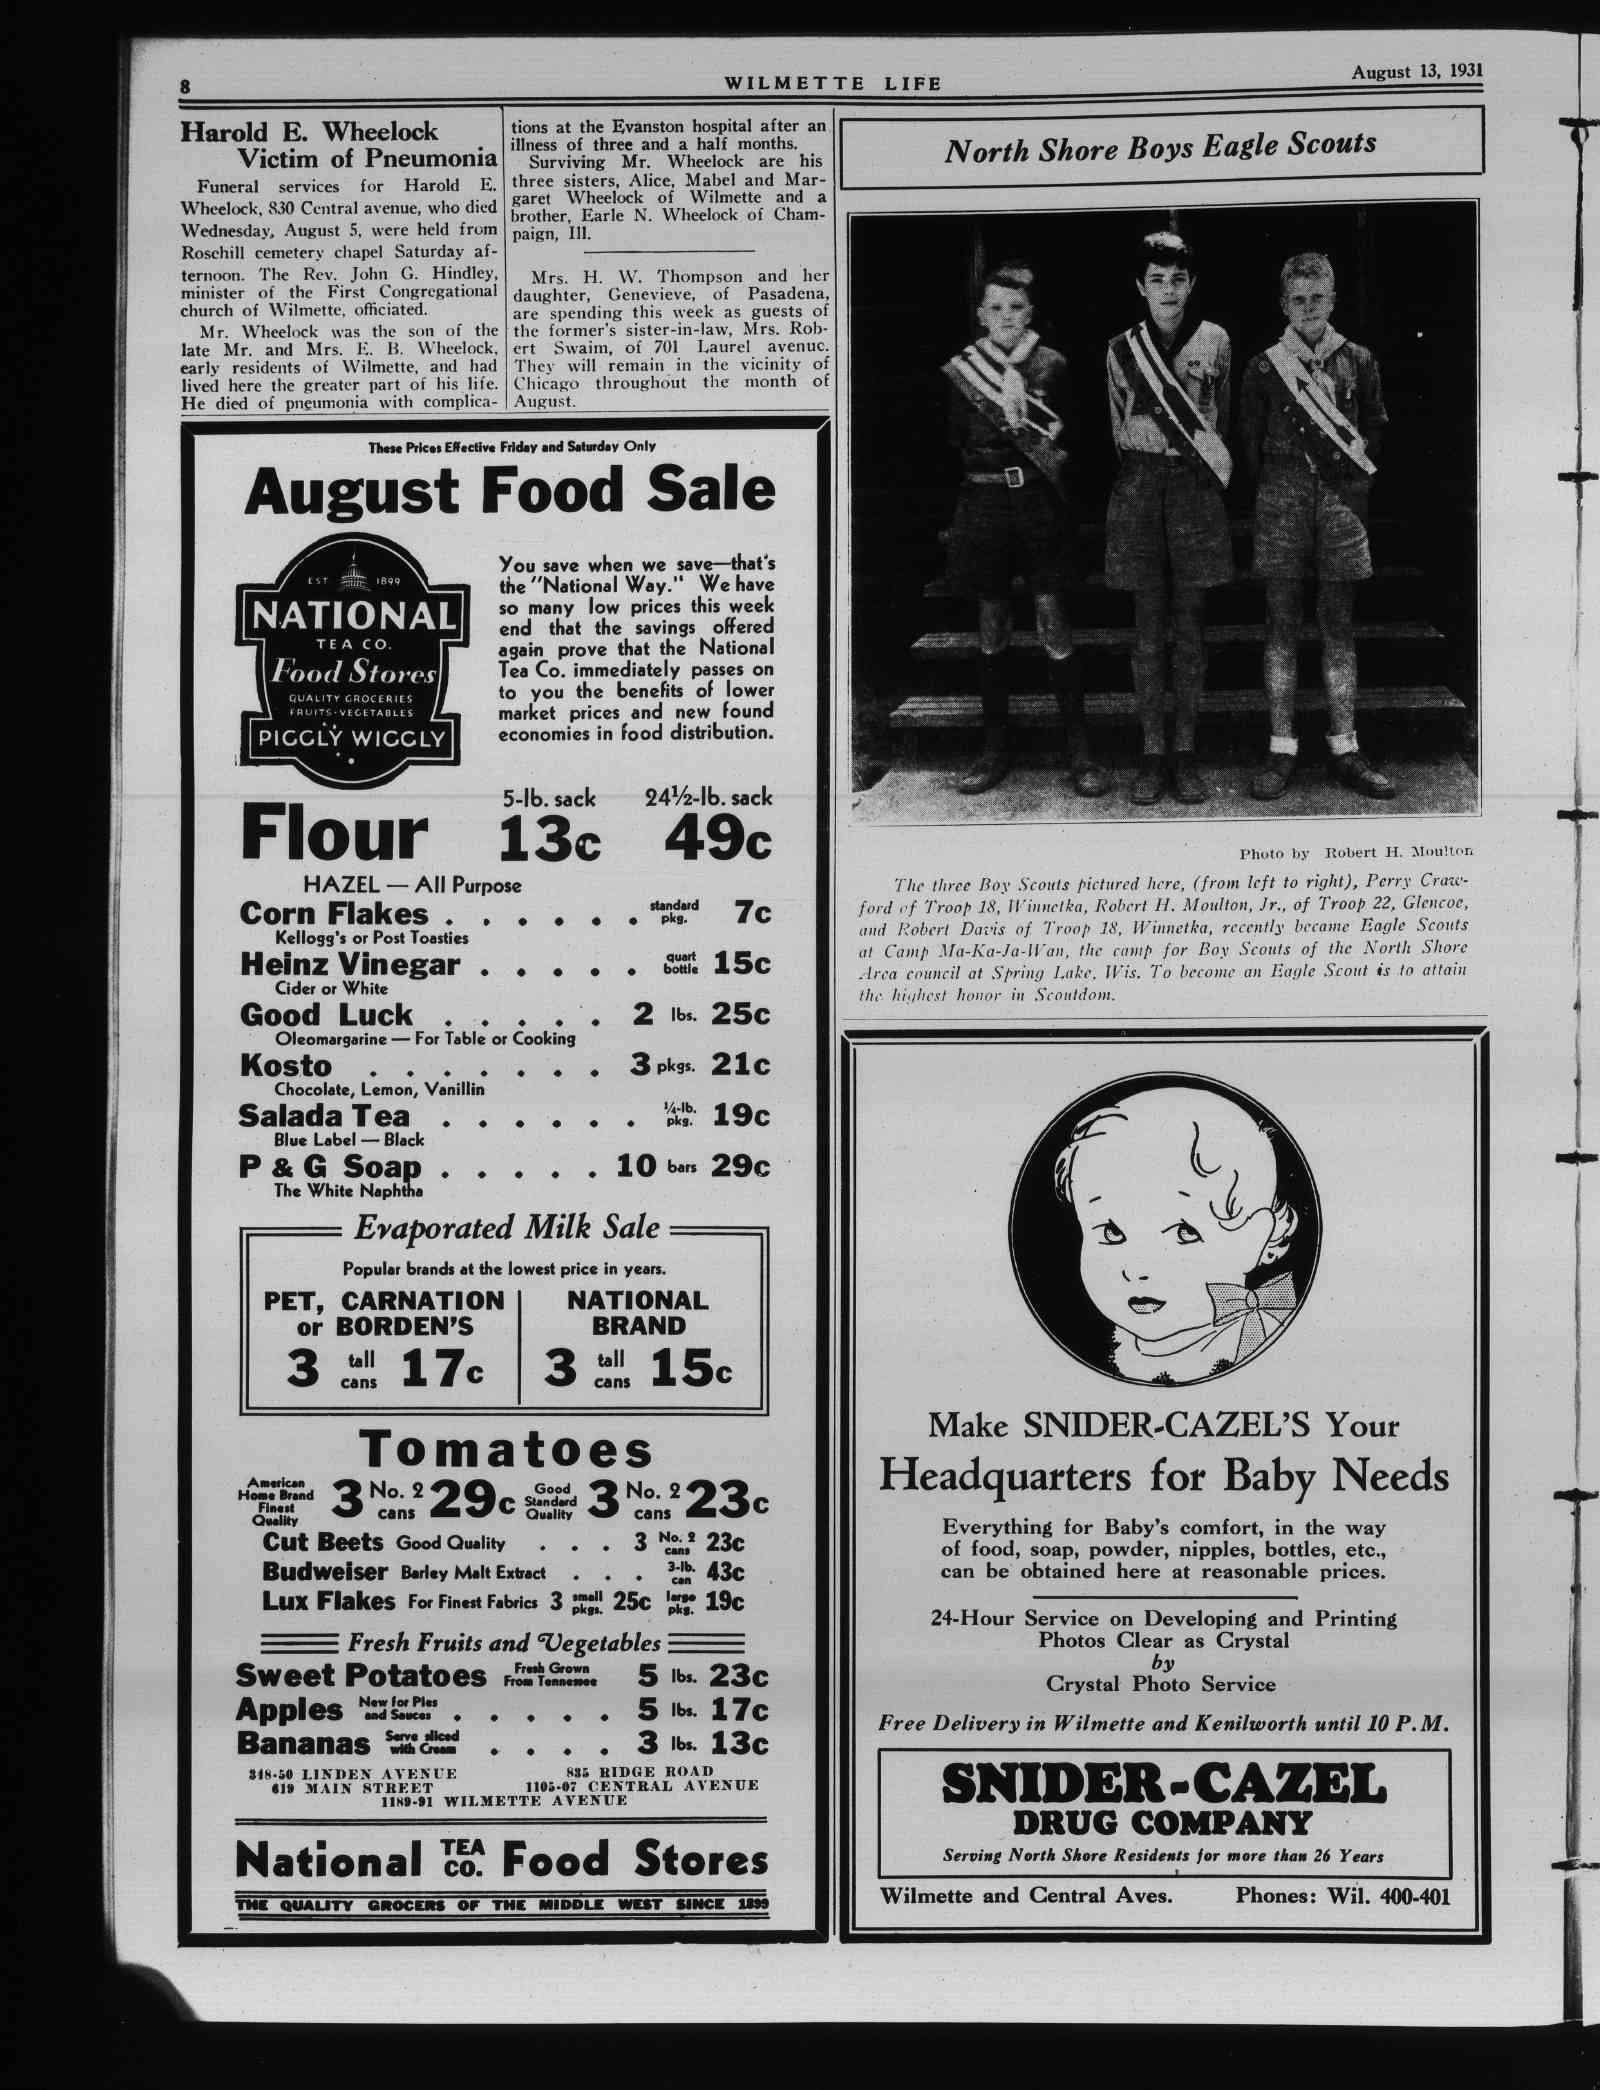 Wilmette Life (Wilmette, Illinois), 13 Aug 1931